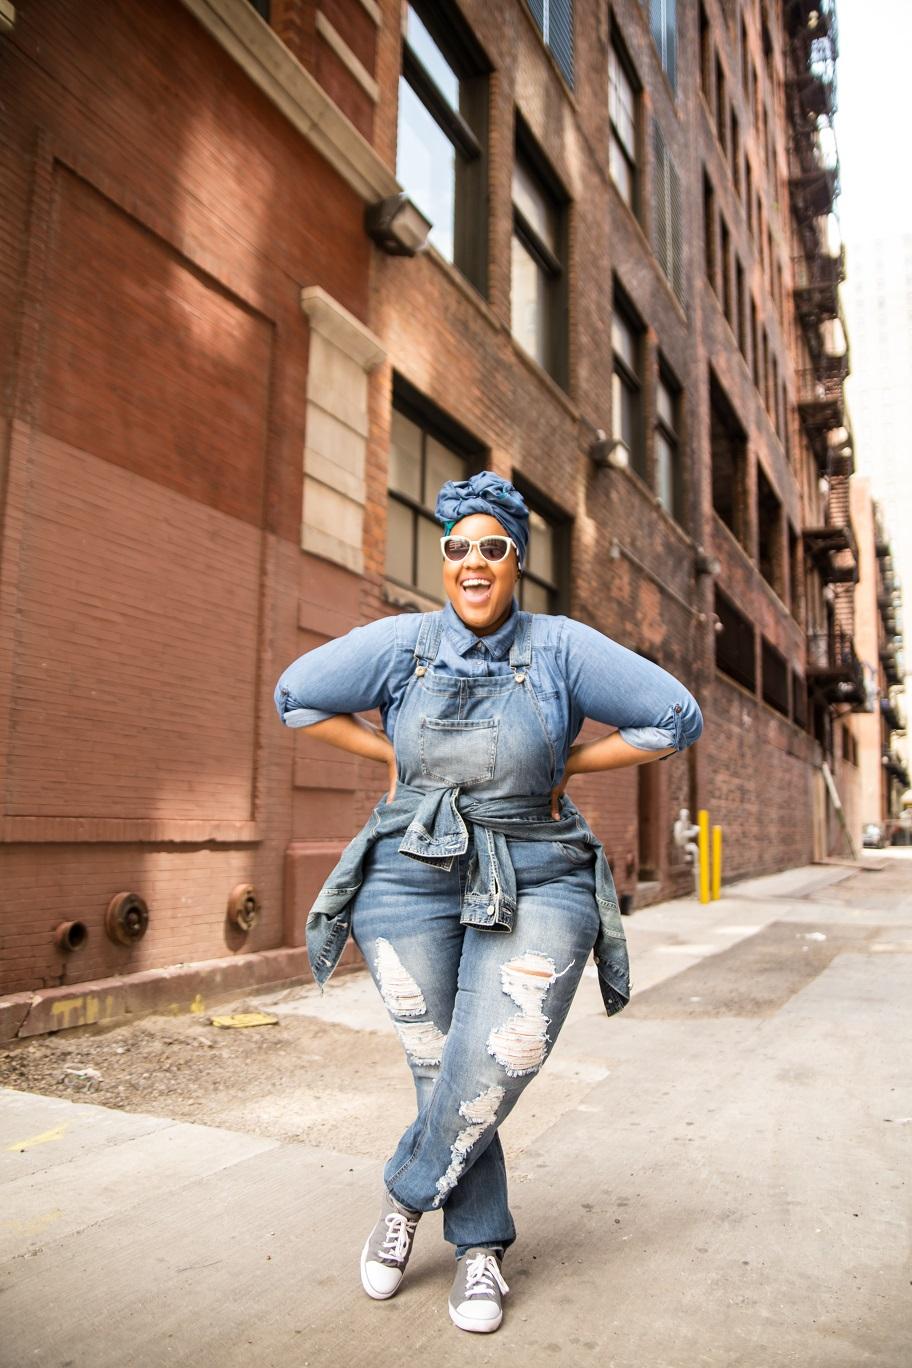 Leah-Vernon-Plus-Size-Model-Detroit-Blogger-Muslim-Girl-Body-positive-2